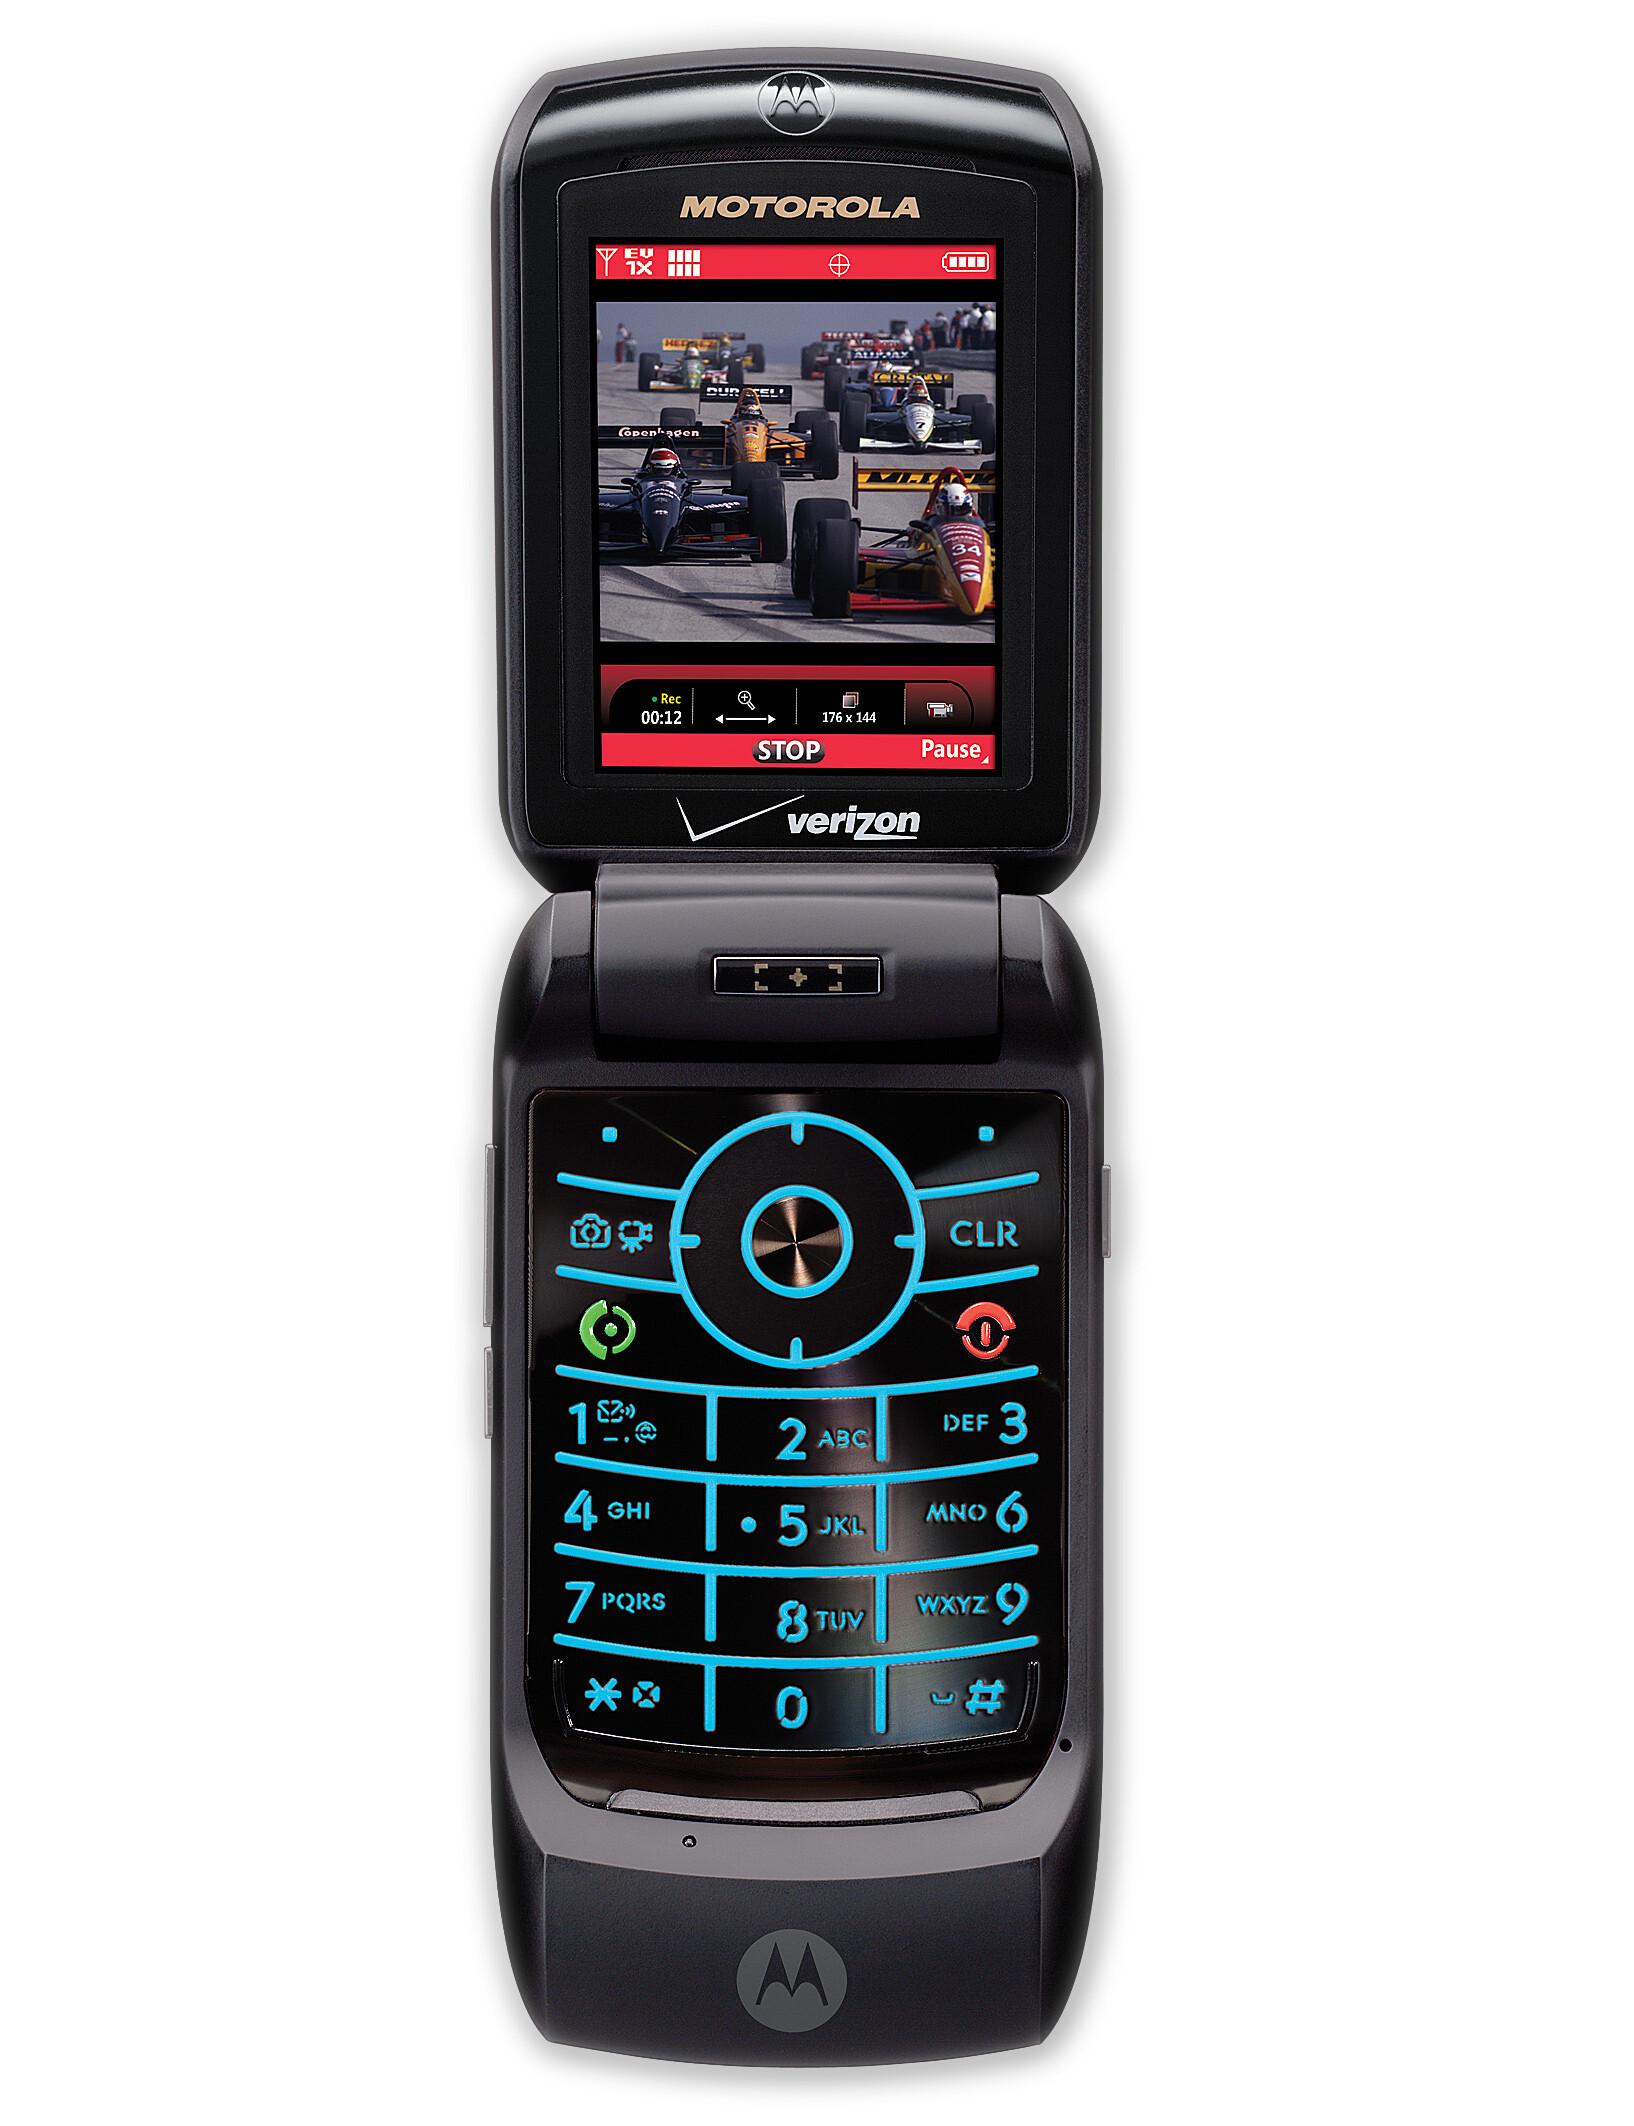 motorola razr maxx ve photos rh phonearena com Motorola RAZR V2 Motorola RAZR V3xx